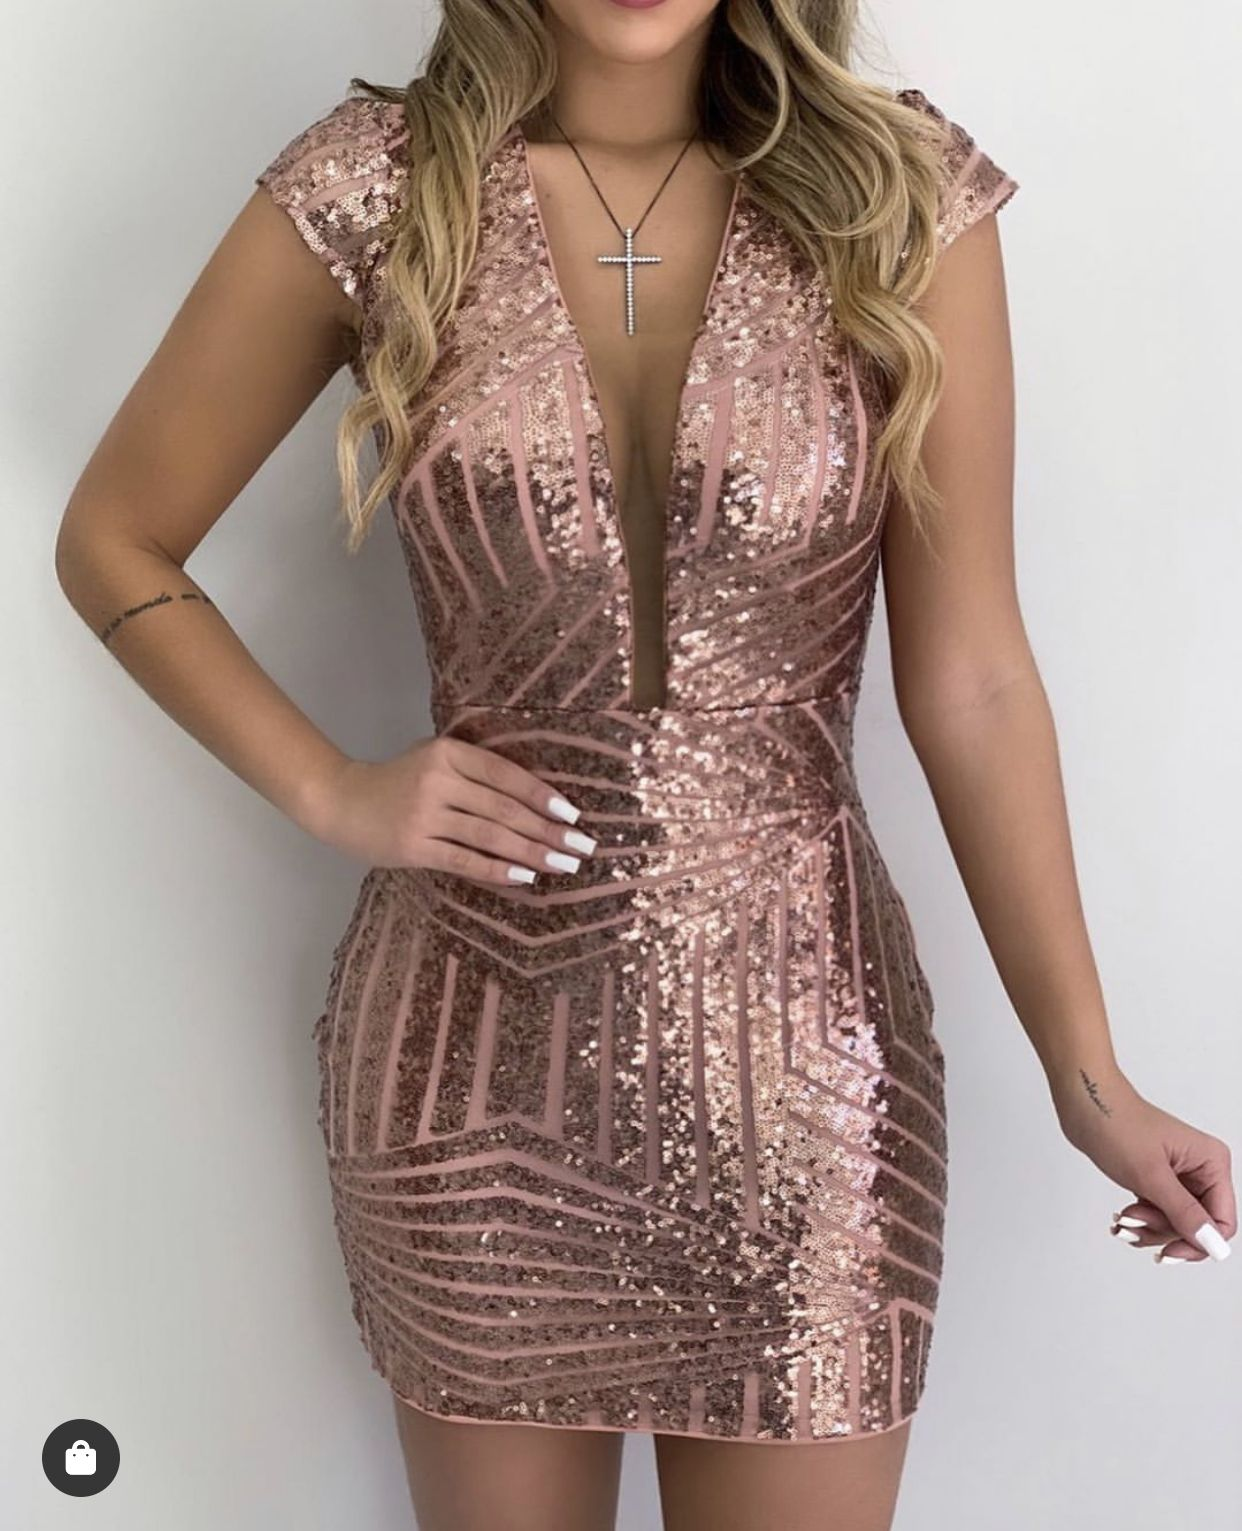 Pin de Ana Belen Crespo em Ropa de moda | Vestido paete, Saia formal,  Vestidos